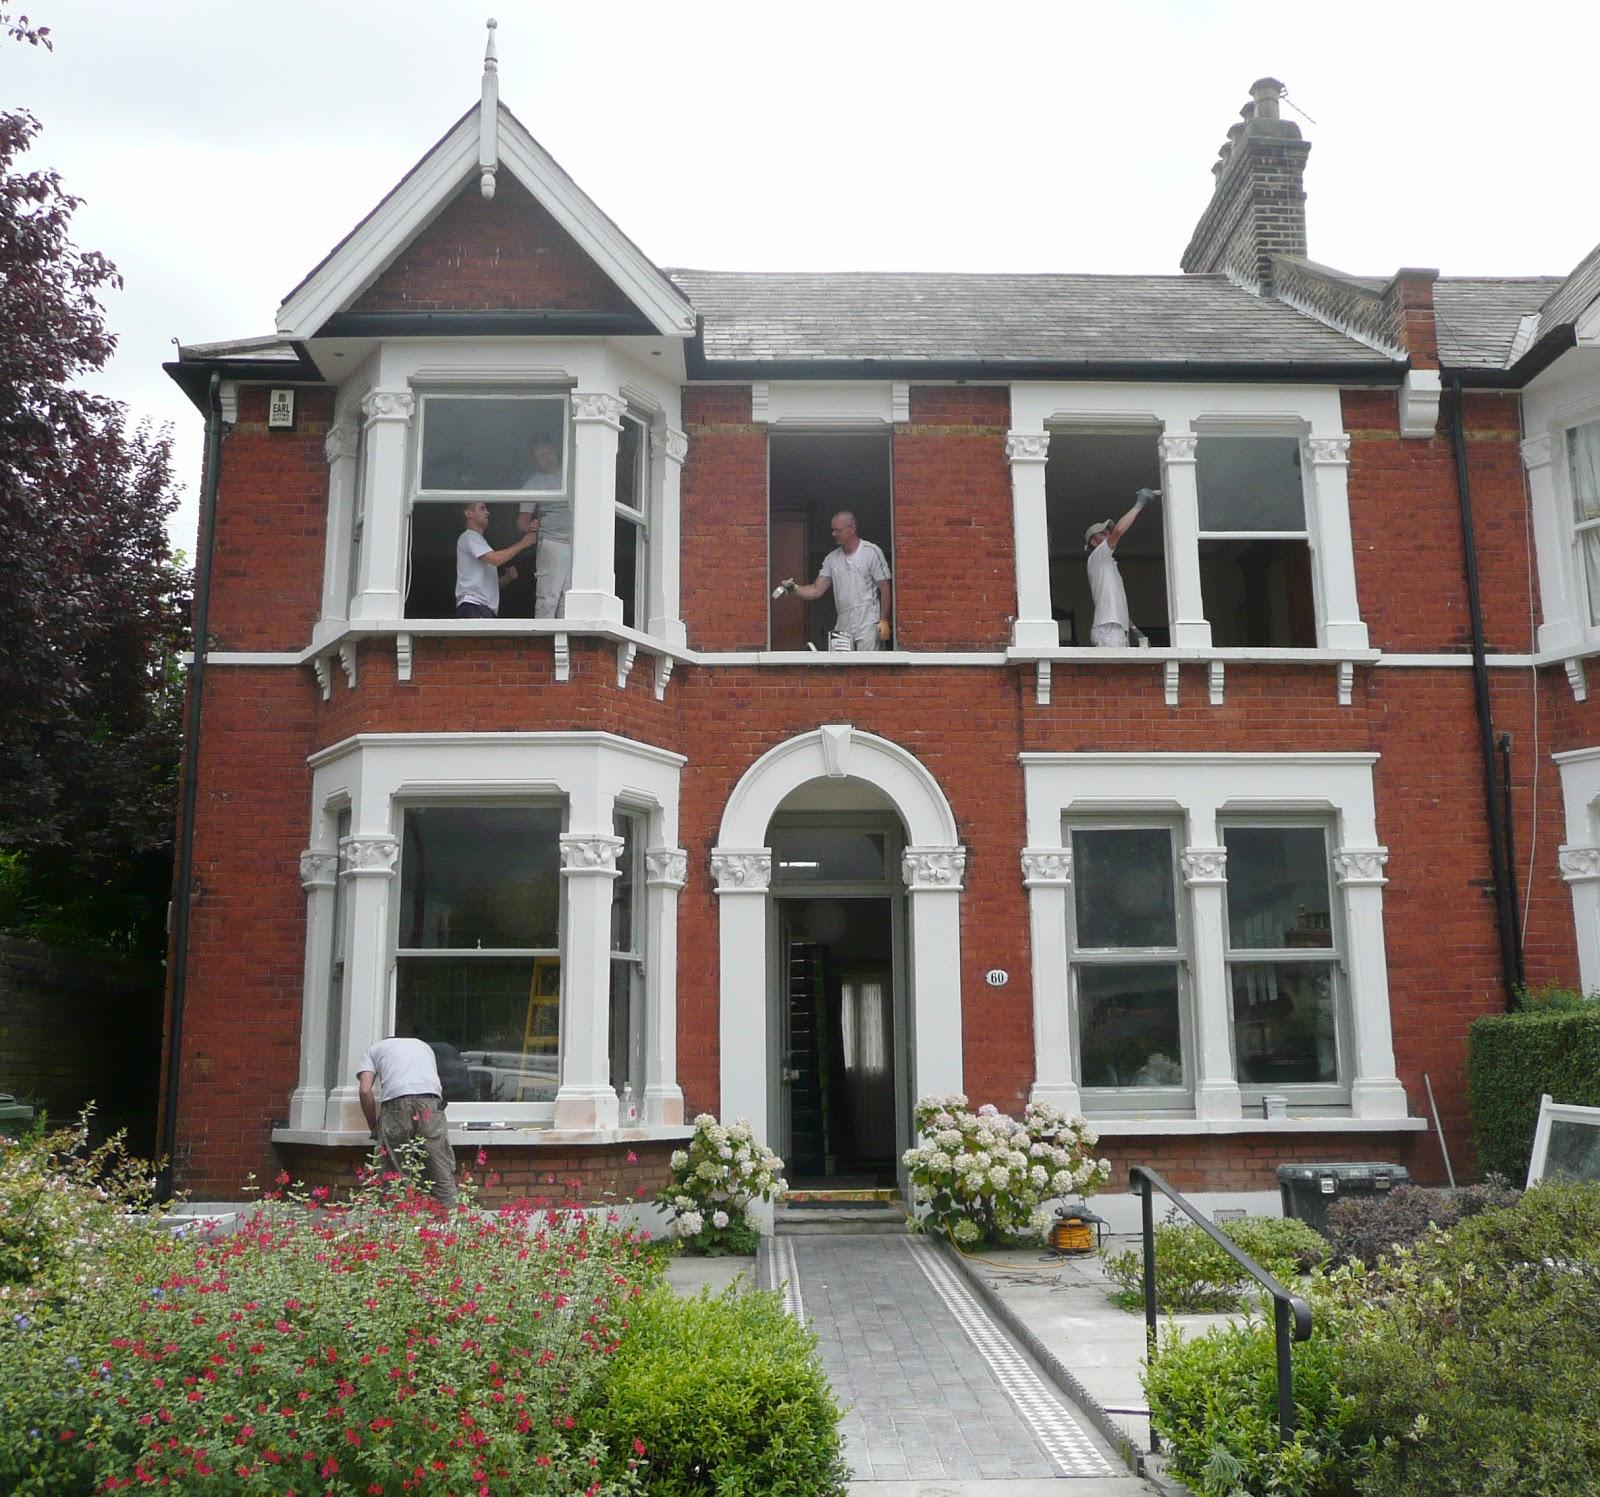 sash window repairs london. Black Bedroom Furniture Sets. Home Design Ideas